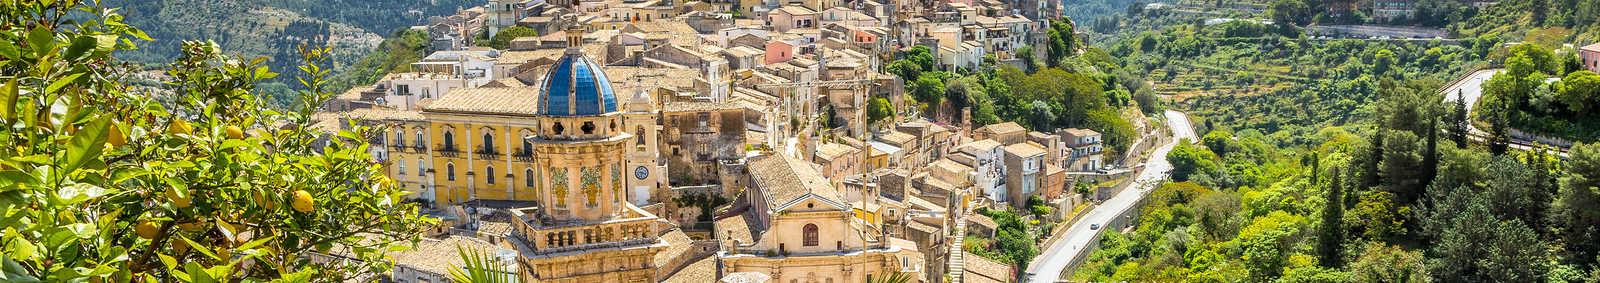 Ragusa Town, Italy